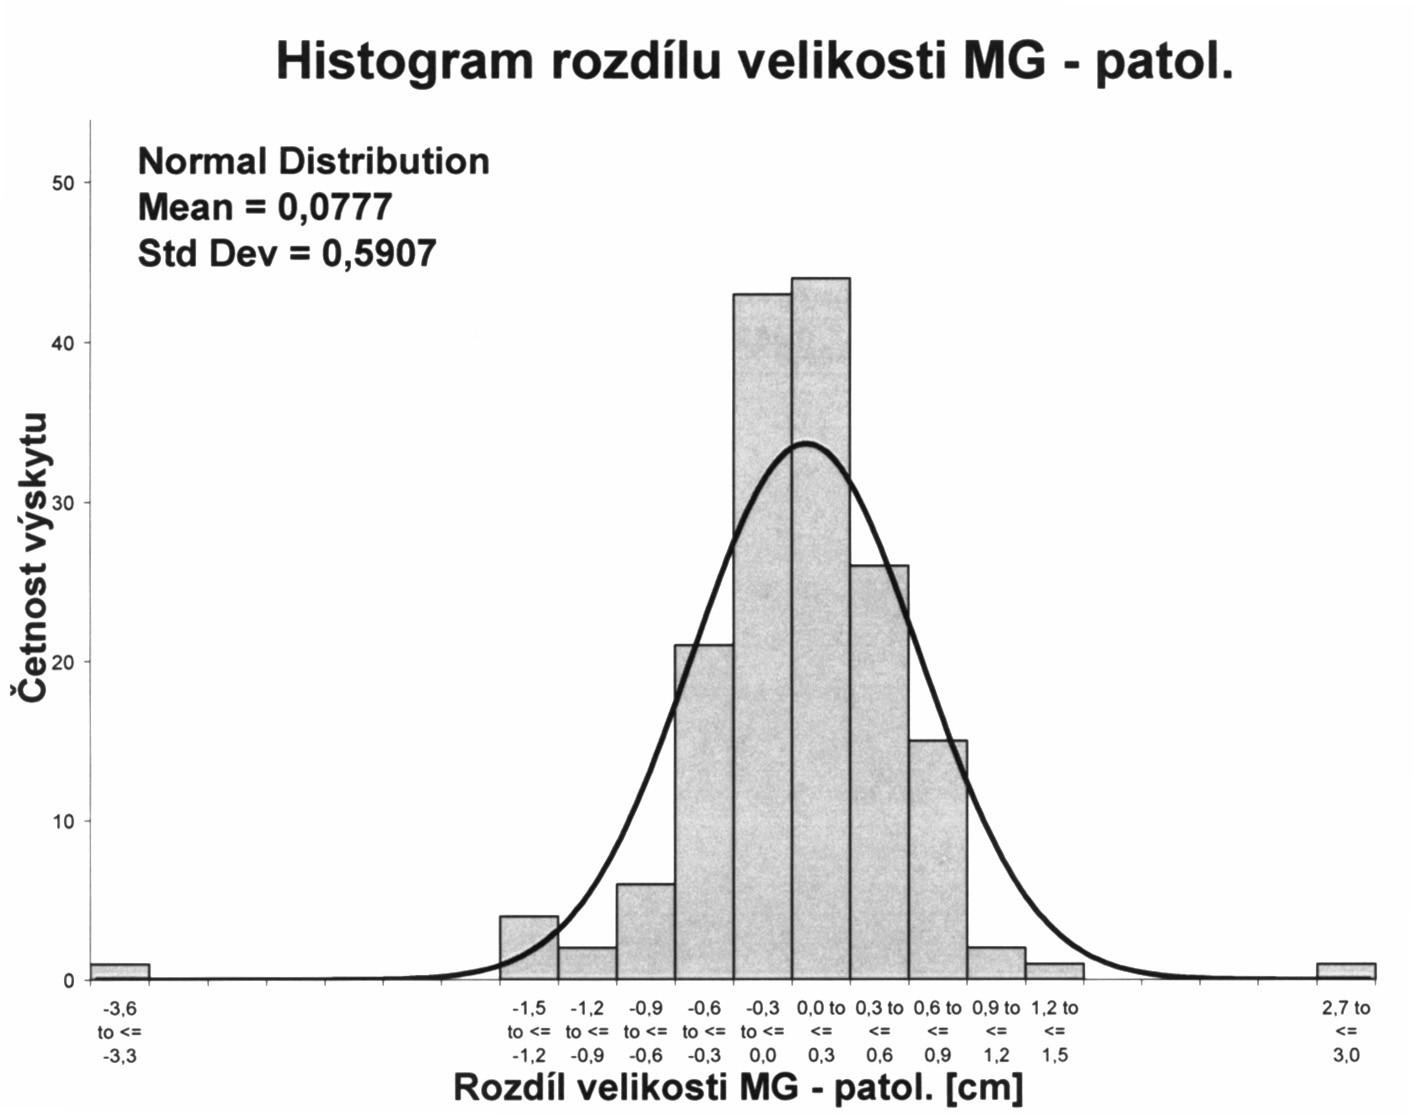 Histogram rozdílu velikosti tumoru stanovené MG a histopatologické velikosti Graph 5. Histogram of the difference between the tumor size established on MG and the histopathological size